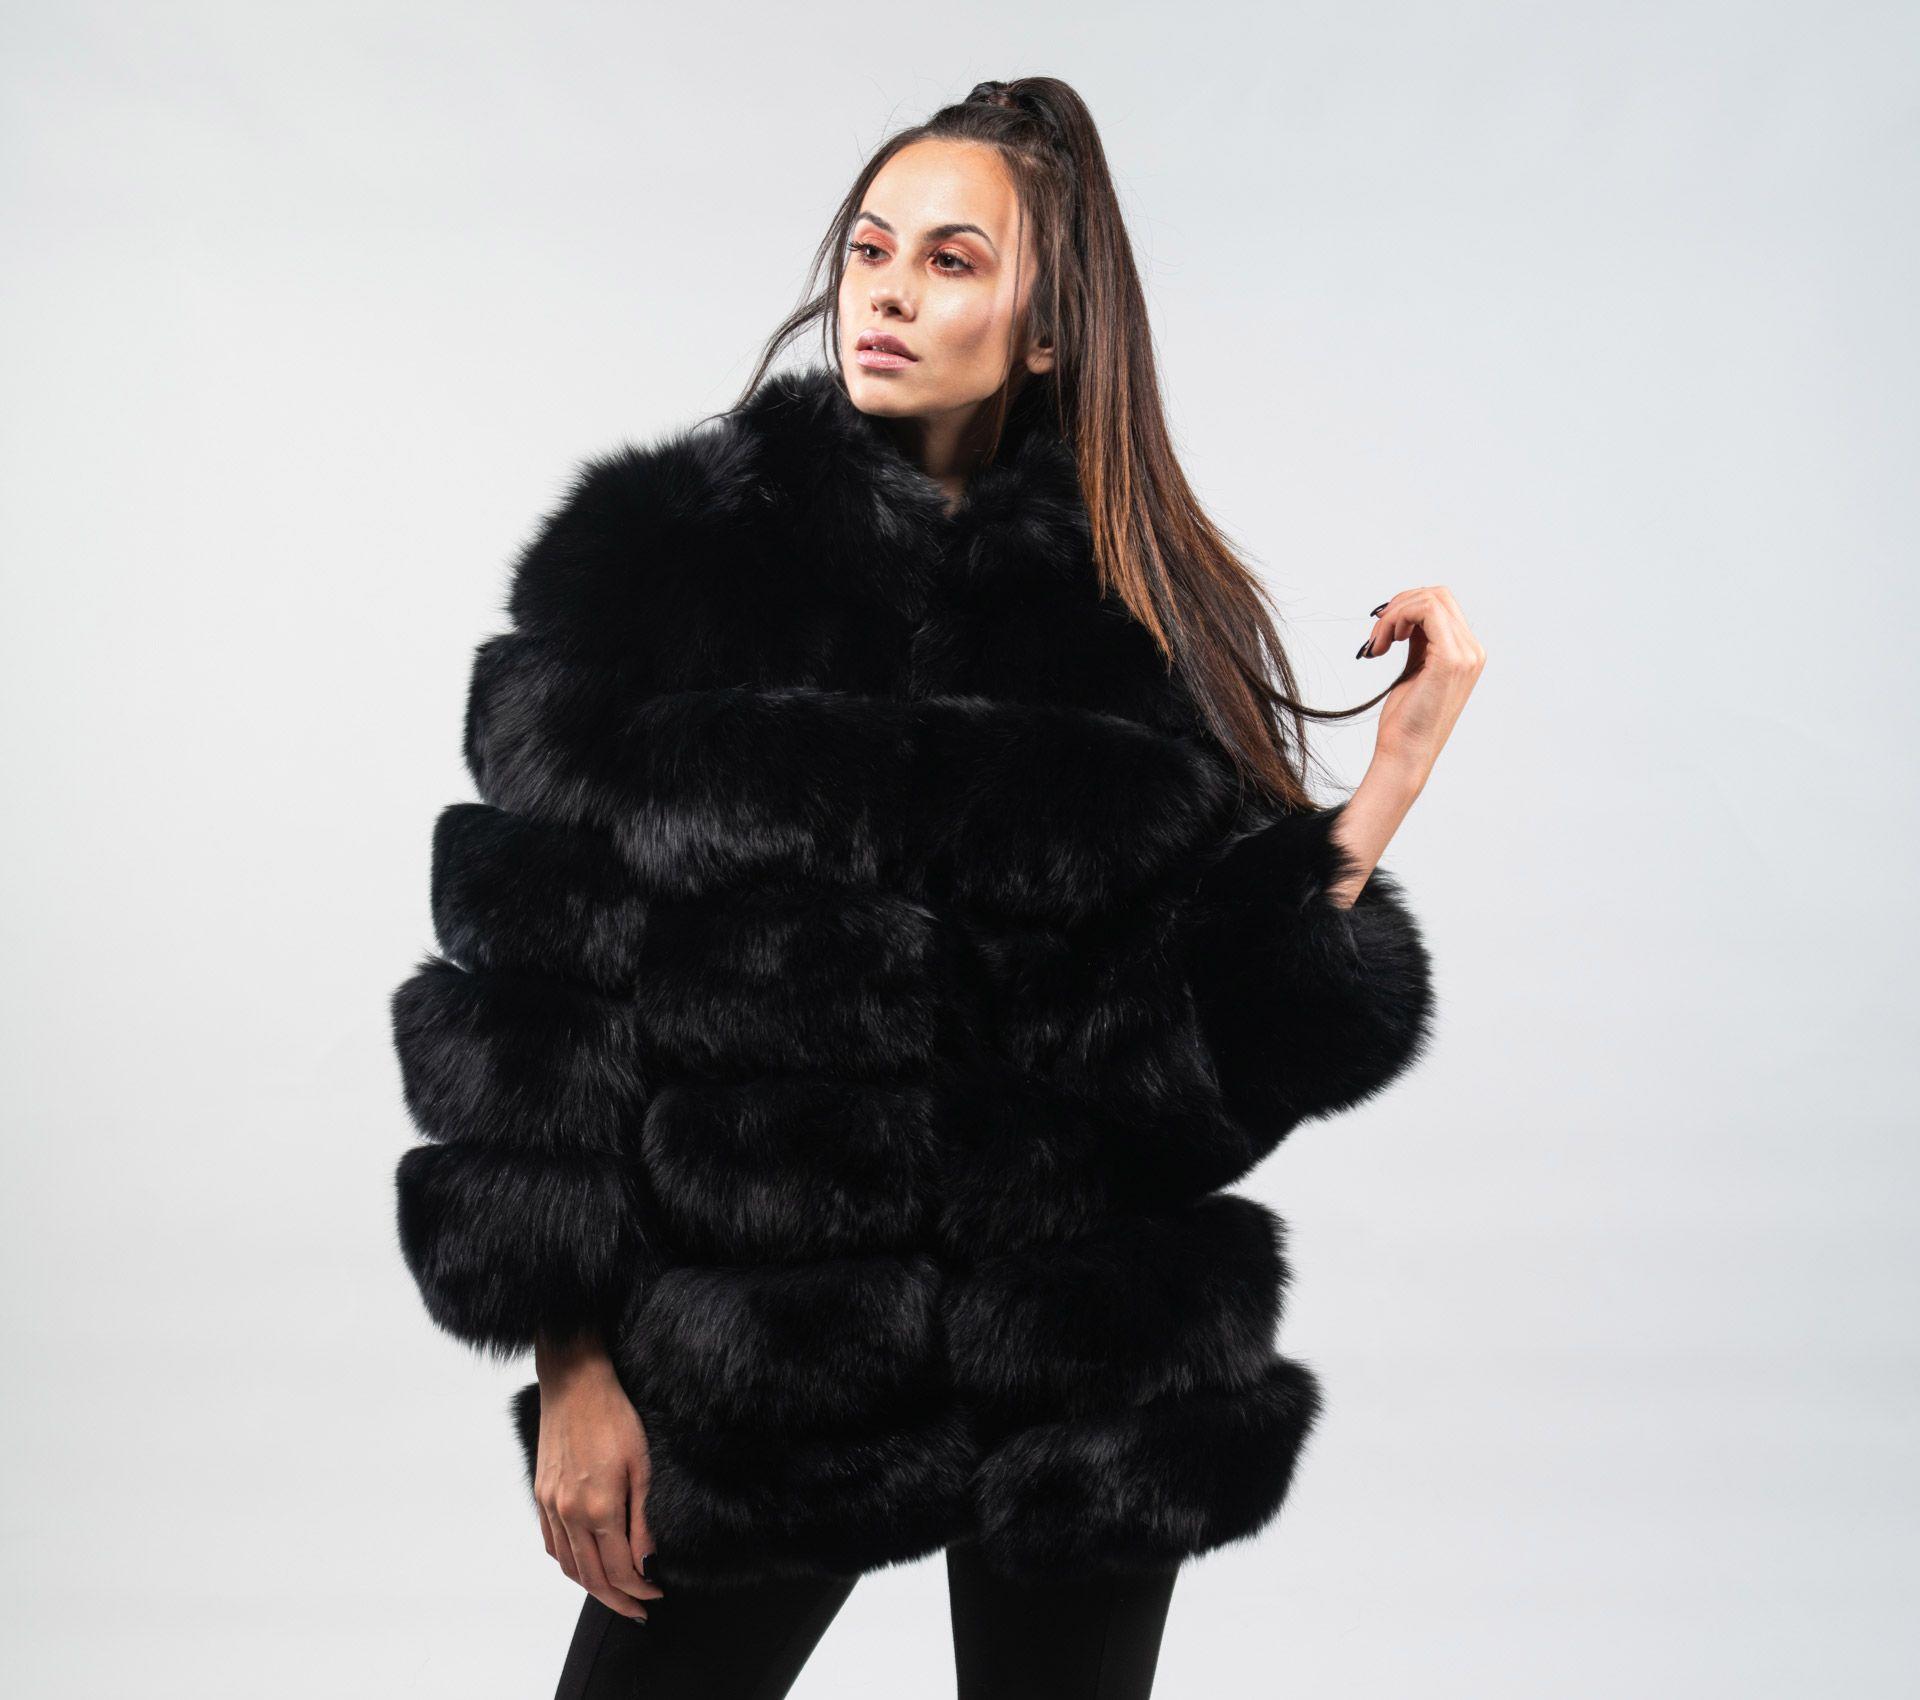 f3e8bfe01a Black Fox Fur Jacket With 7/8 Sleeves | Fur coats 9 | Fox fur jacket ...